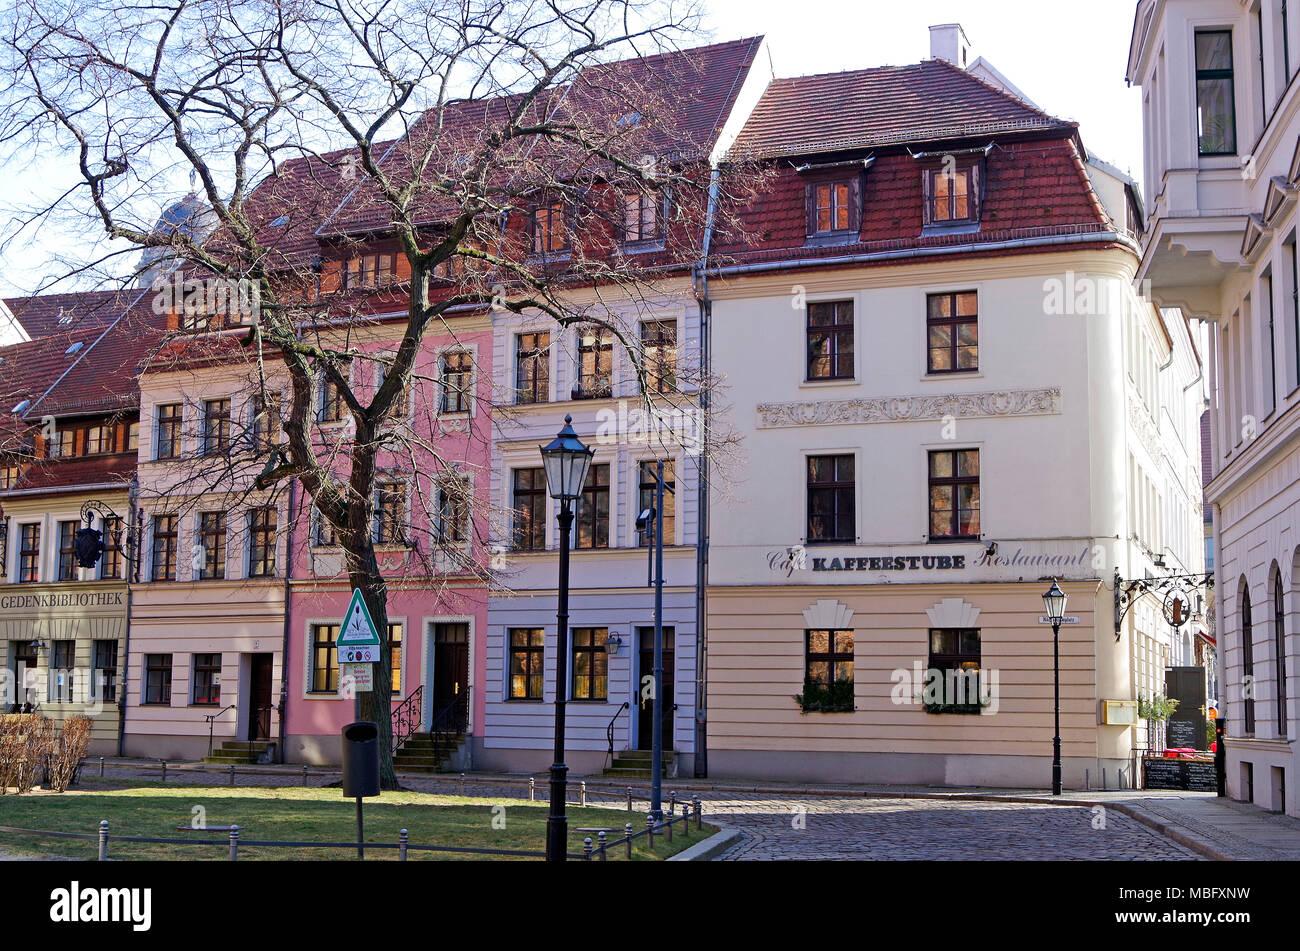 Buildings in Nikolaikirchplatz Berlin, rebuilt behind accurate reconstructions of houses destroyed in World War 2 - Stock Image